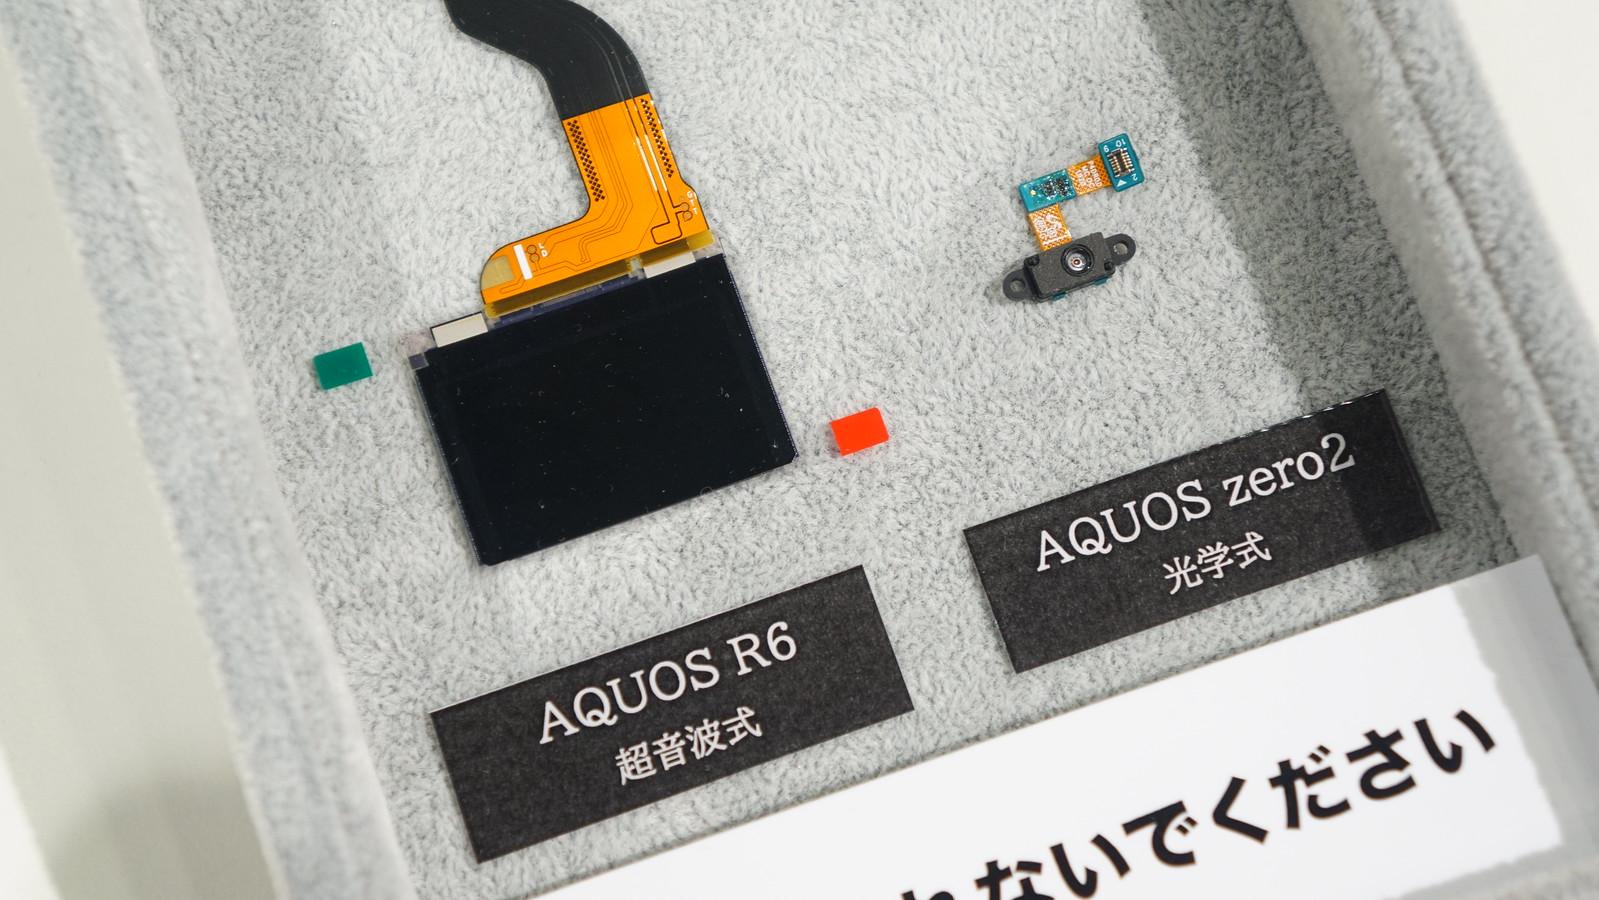 AQUOS R6。指紋認証センサーは光学式から超音波式に変更